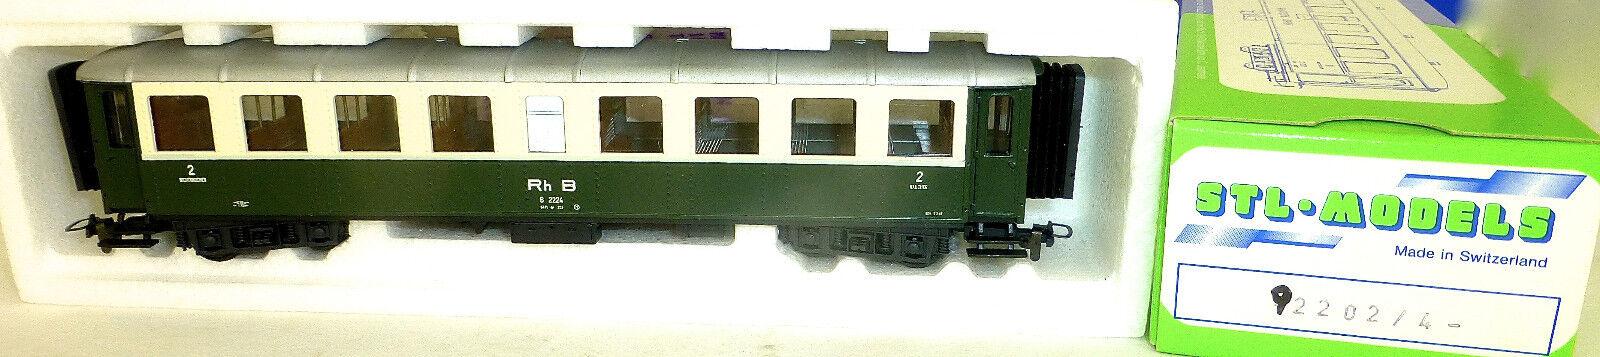 Rhb b 2224  passenger voiture 2ème class vert cream stl models 92202 4  acheter une marque